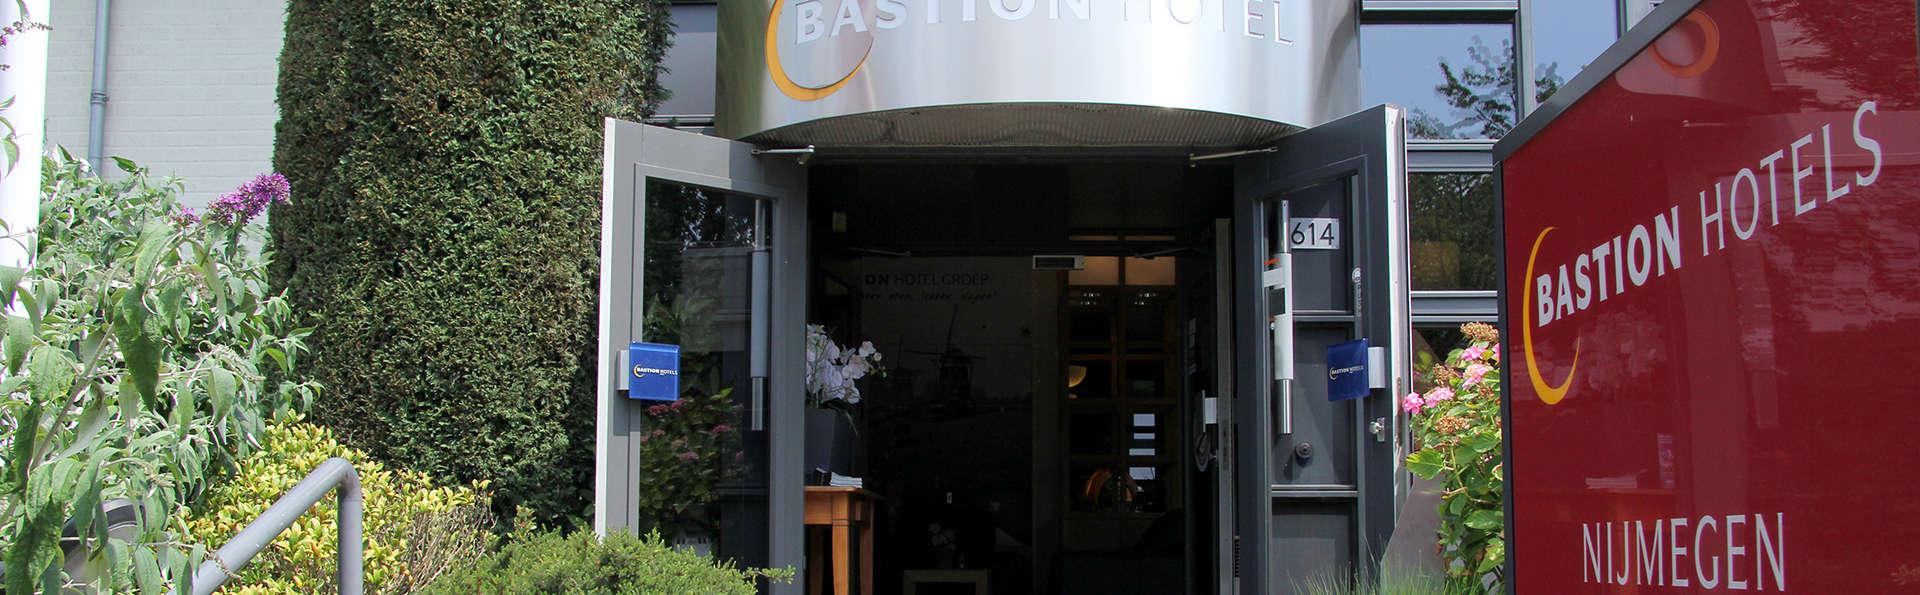 Bastion Hotel Nijmegen - edit_front1.jpg